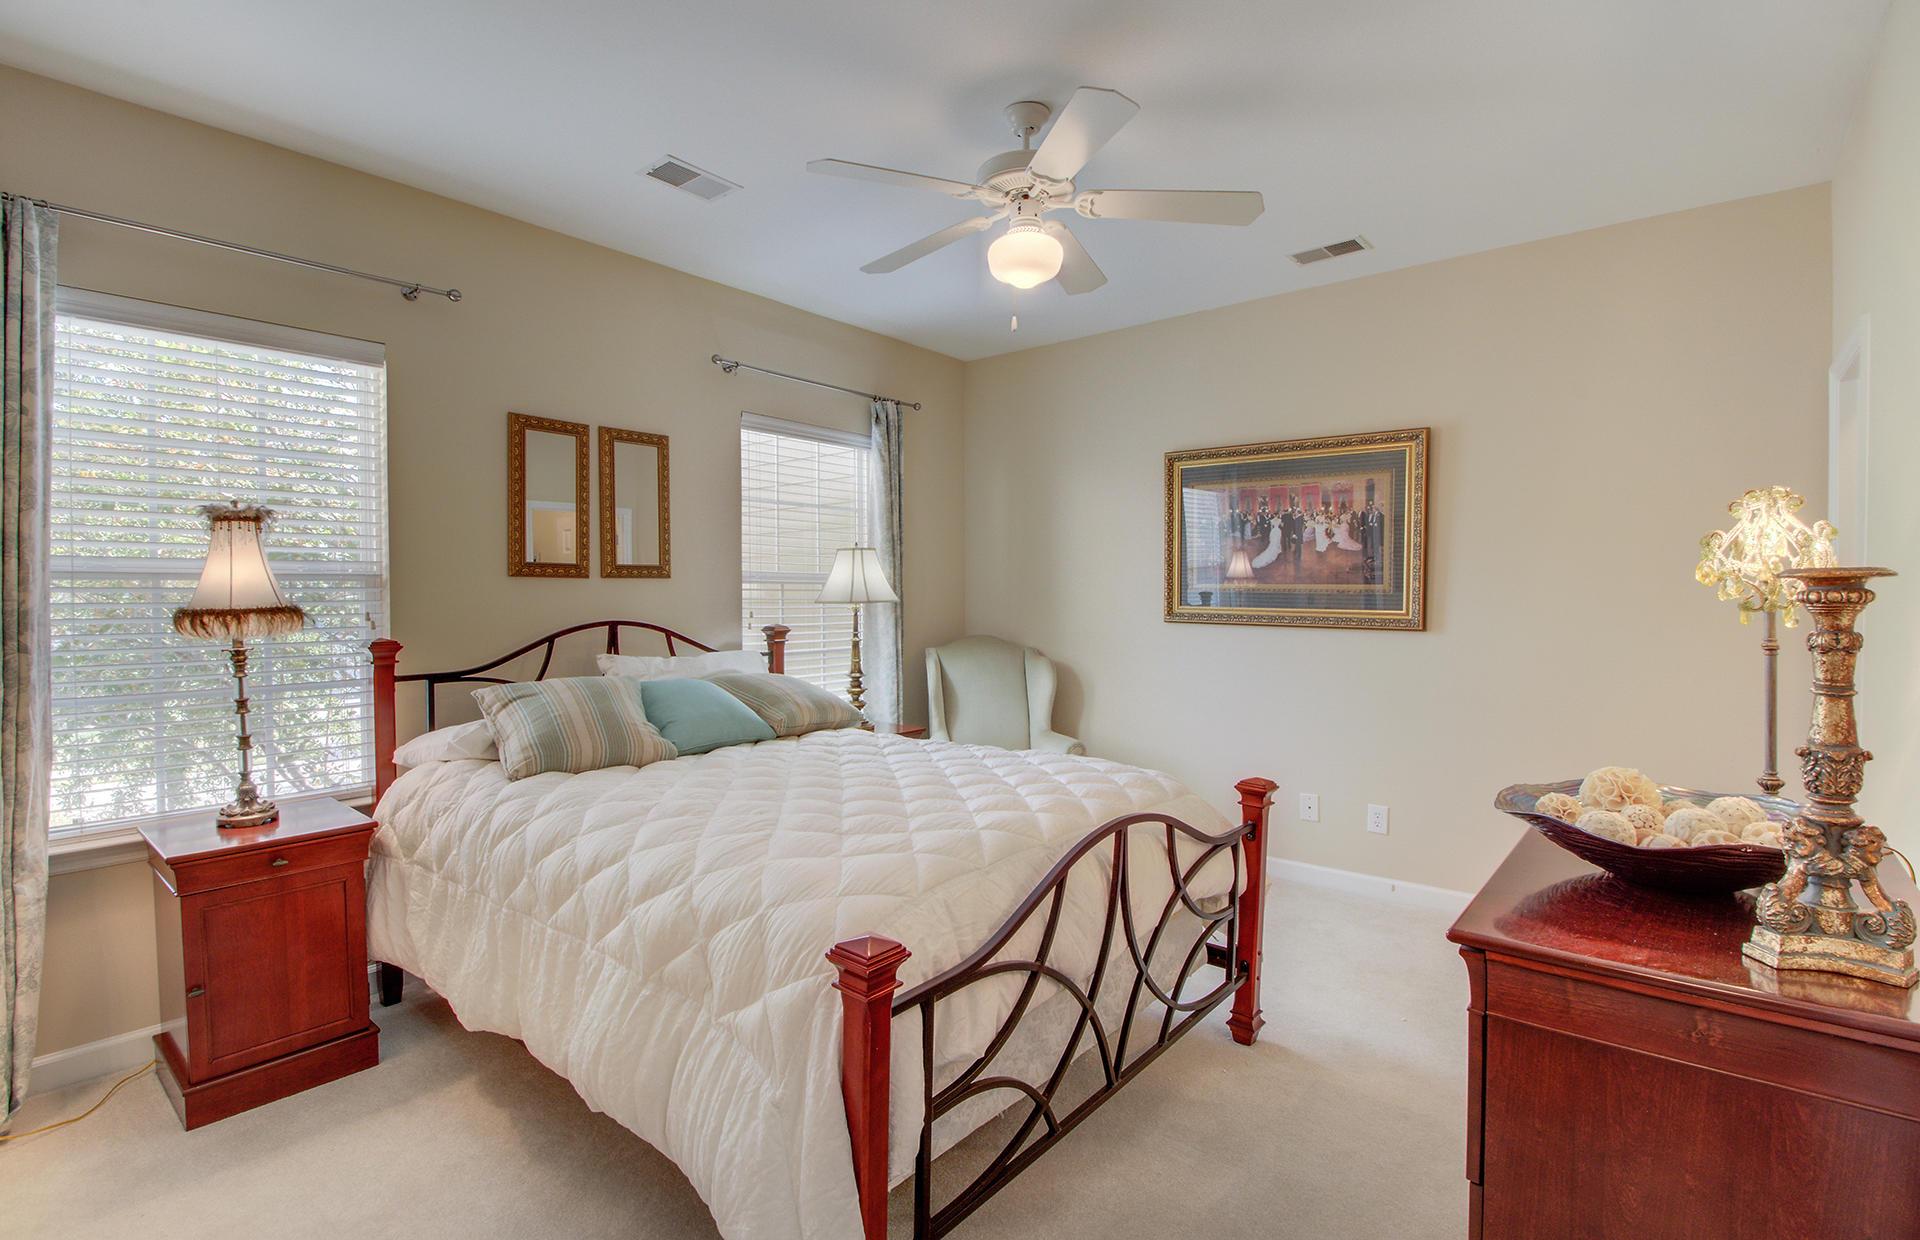 Dunes West Homes For Sale - 145 Fresh Meadow, Mount Pleasant, SC - 31